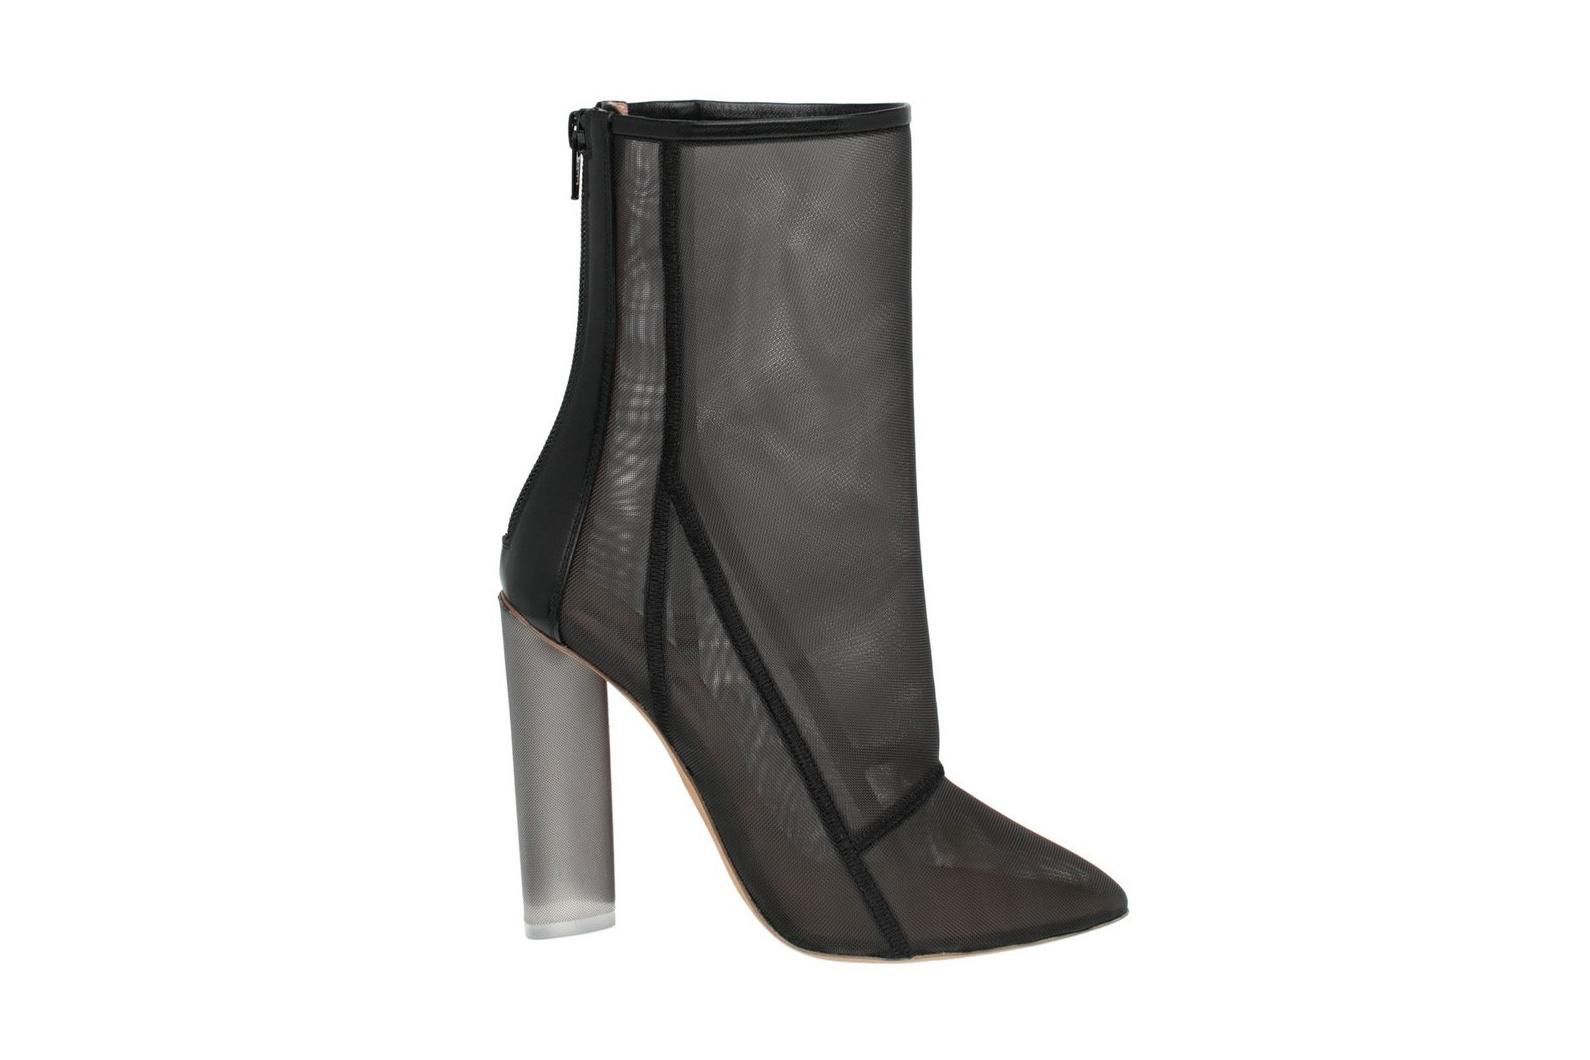 yeezy-season-3-footwear-3.jpg